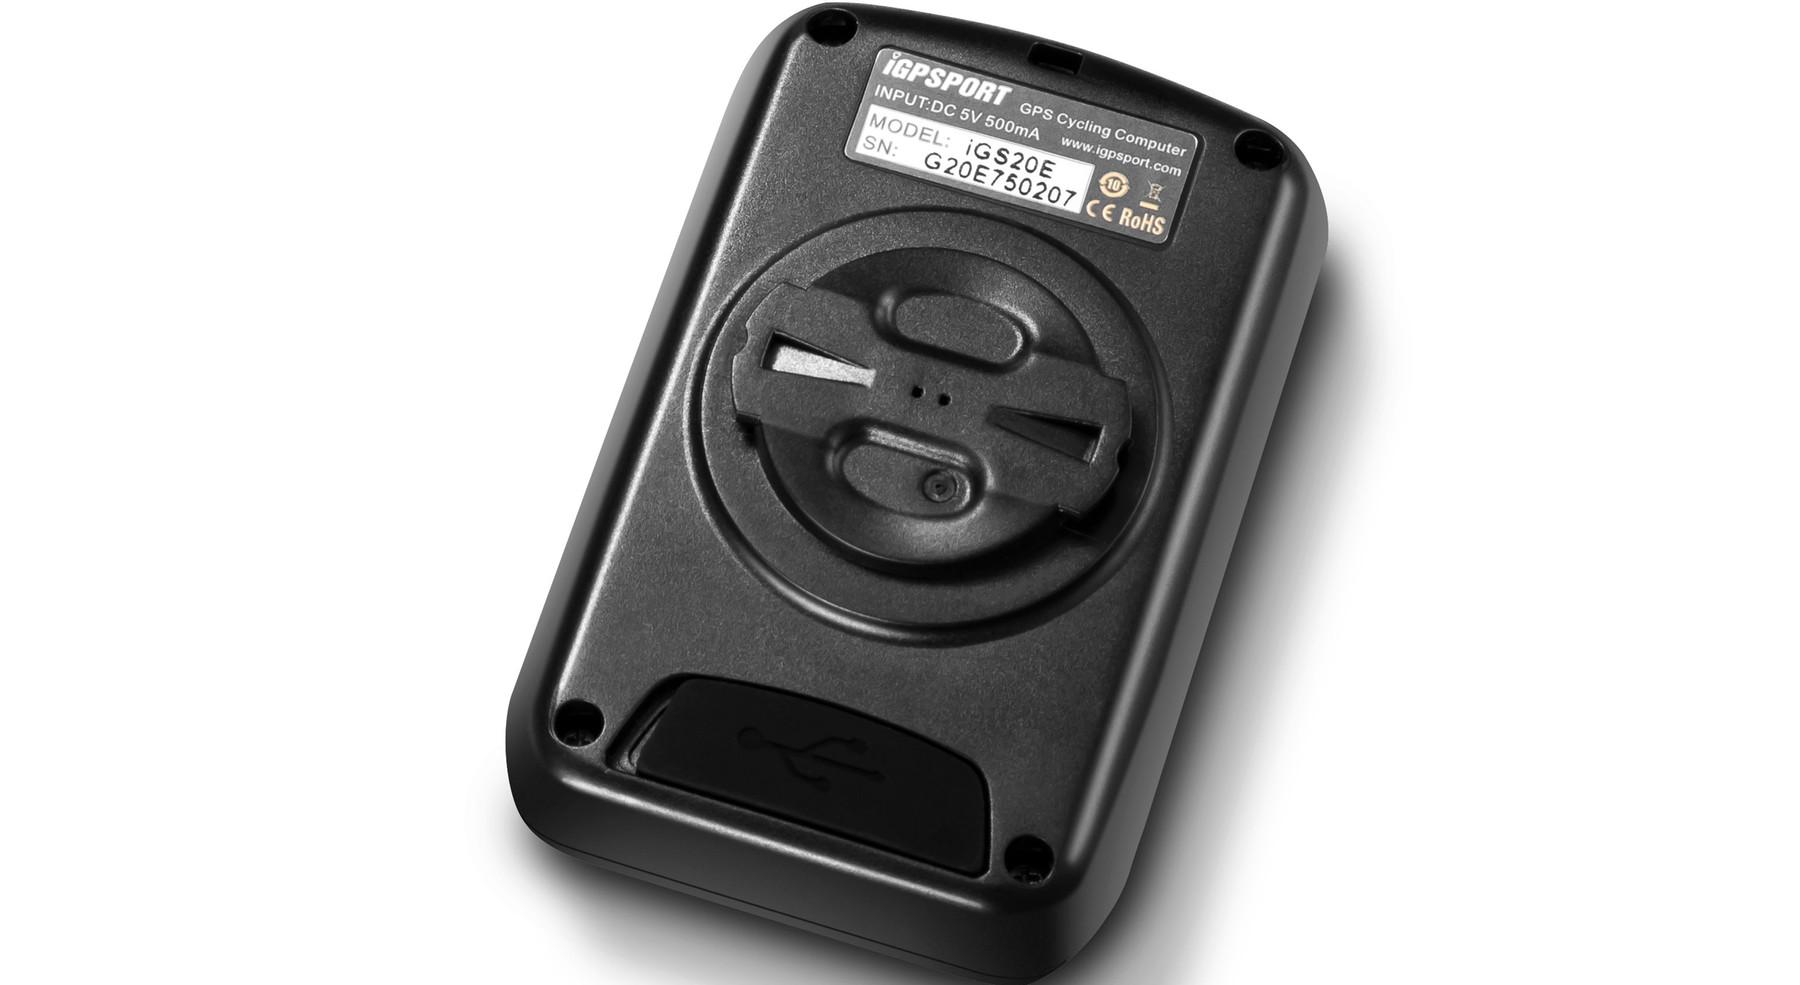 GPS-Cycling-Computer-iGS20E-4.jpg